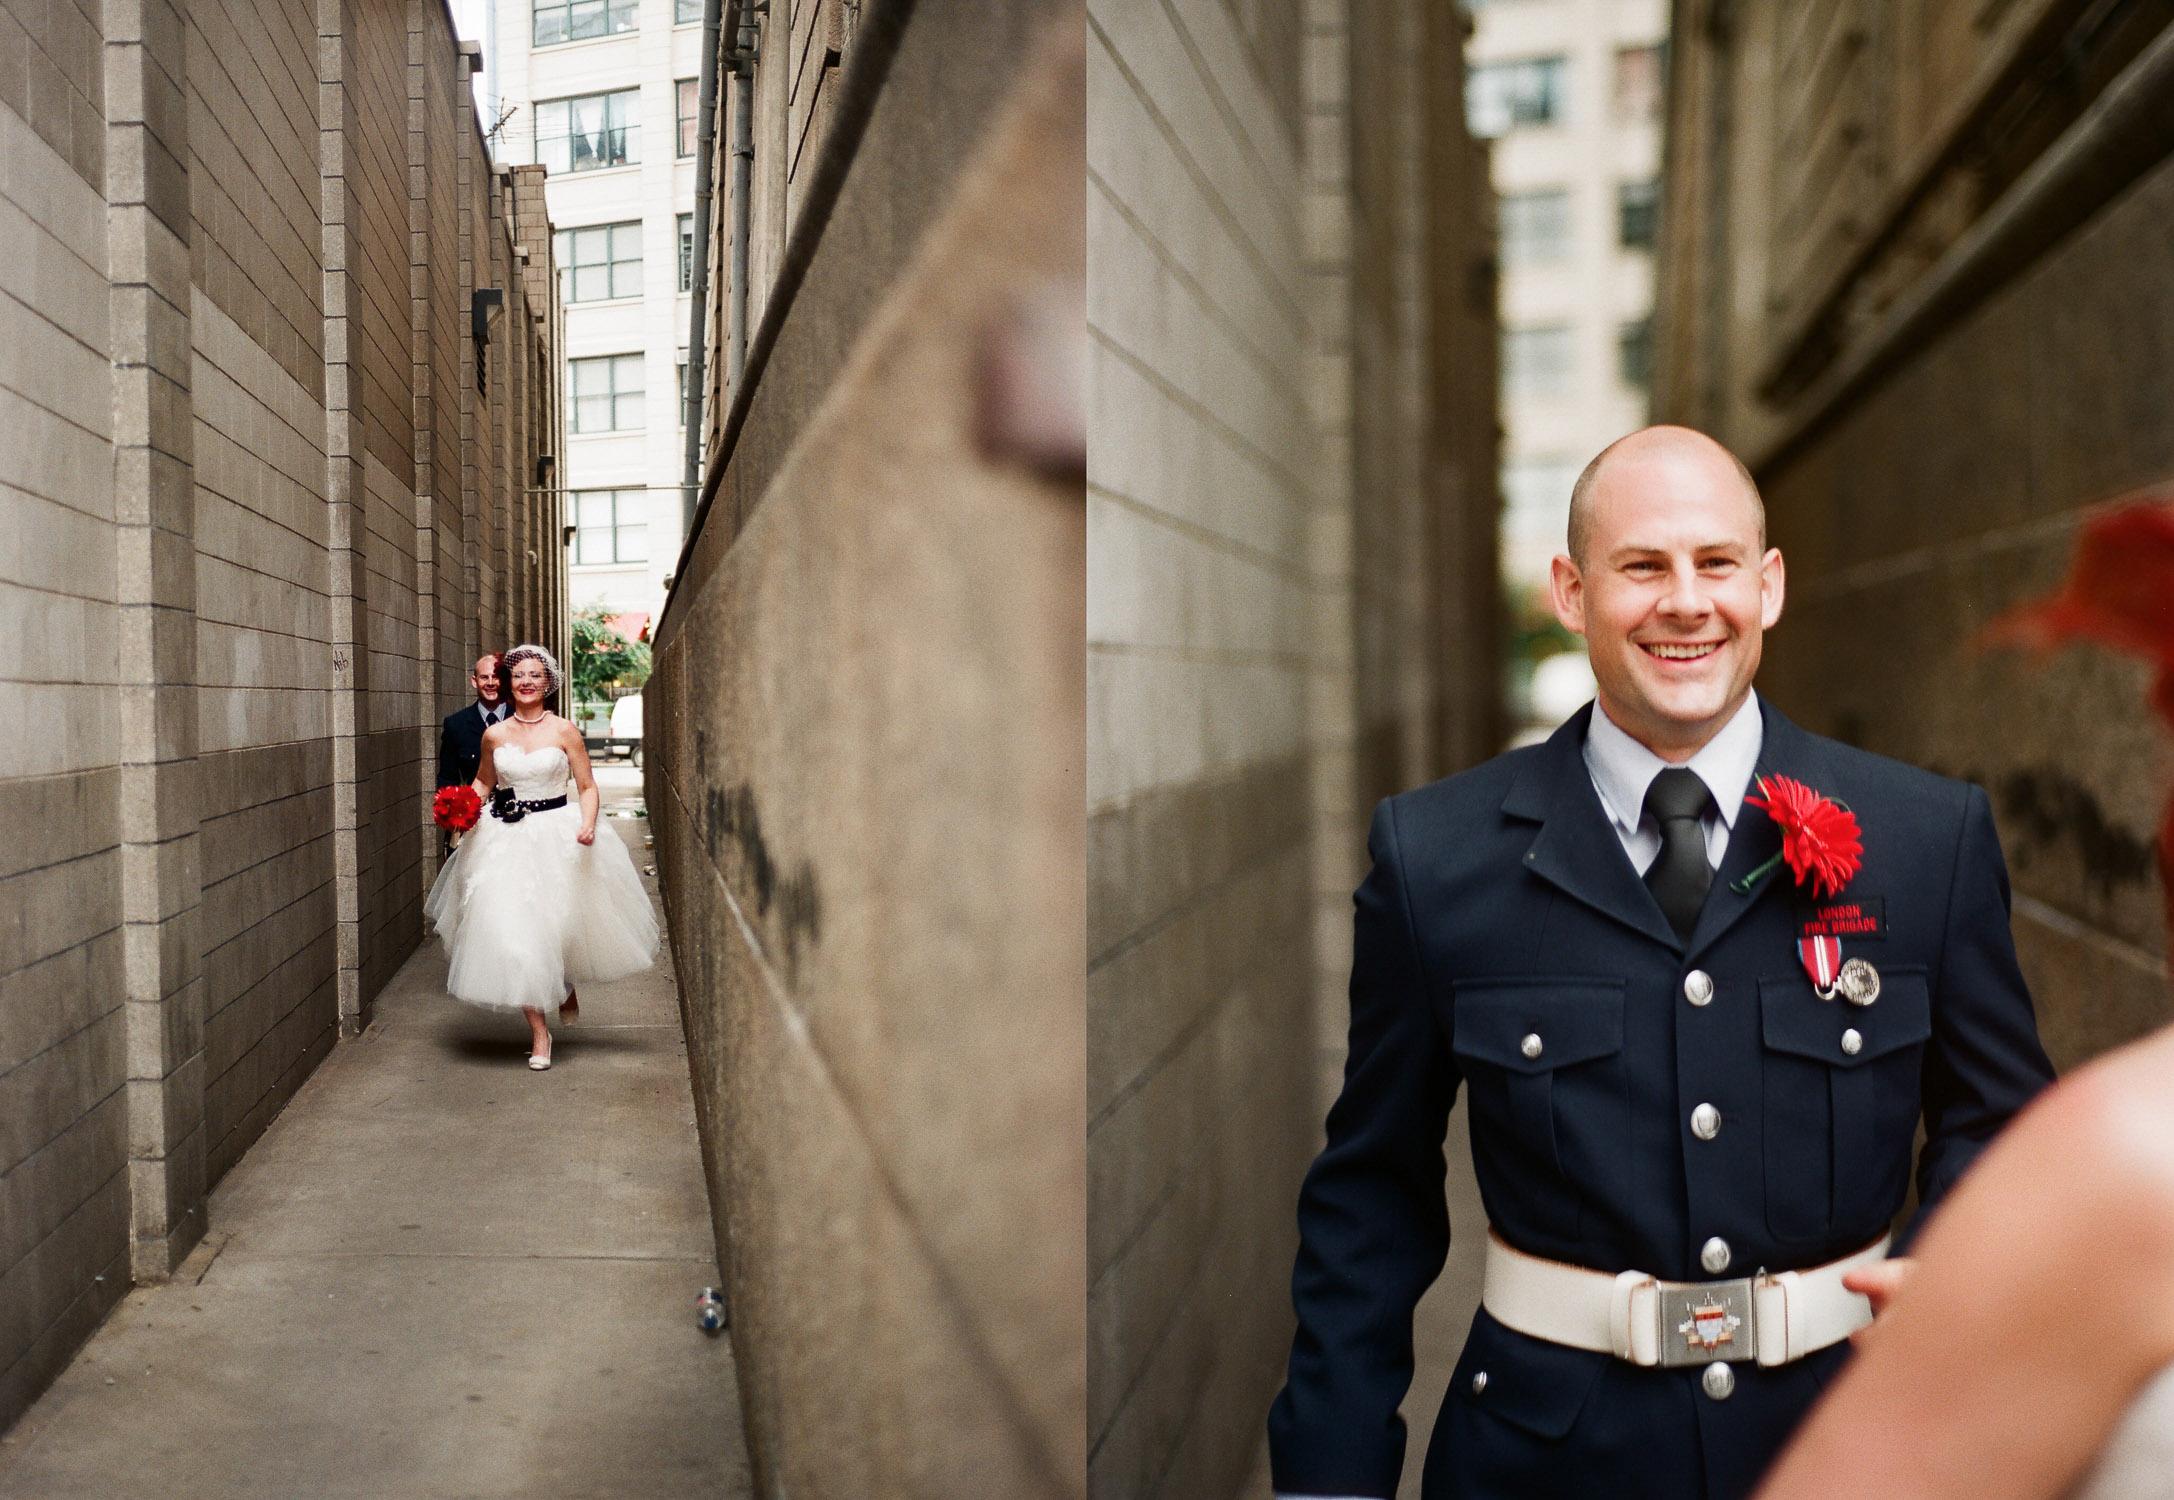 dumbo wedding portraits by wendy g photography